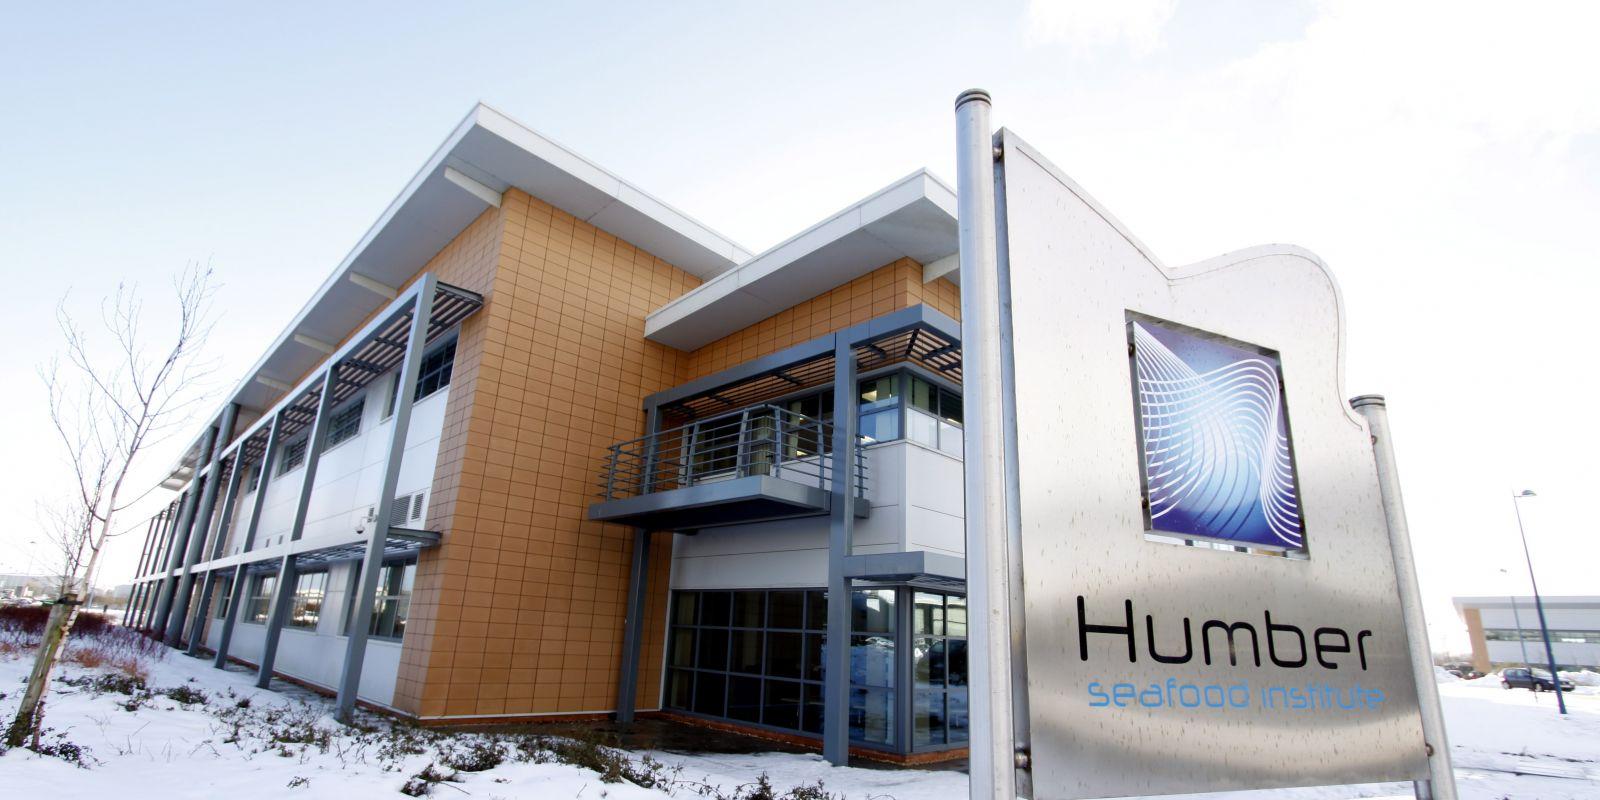 HSI Building Europarc